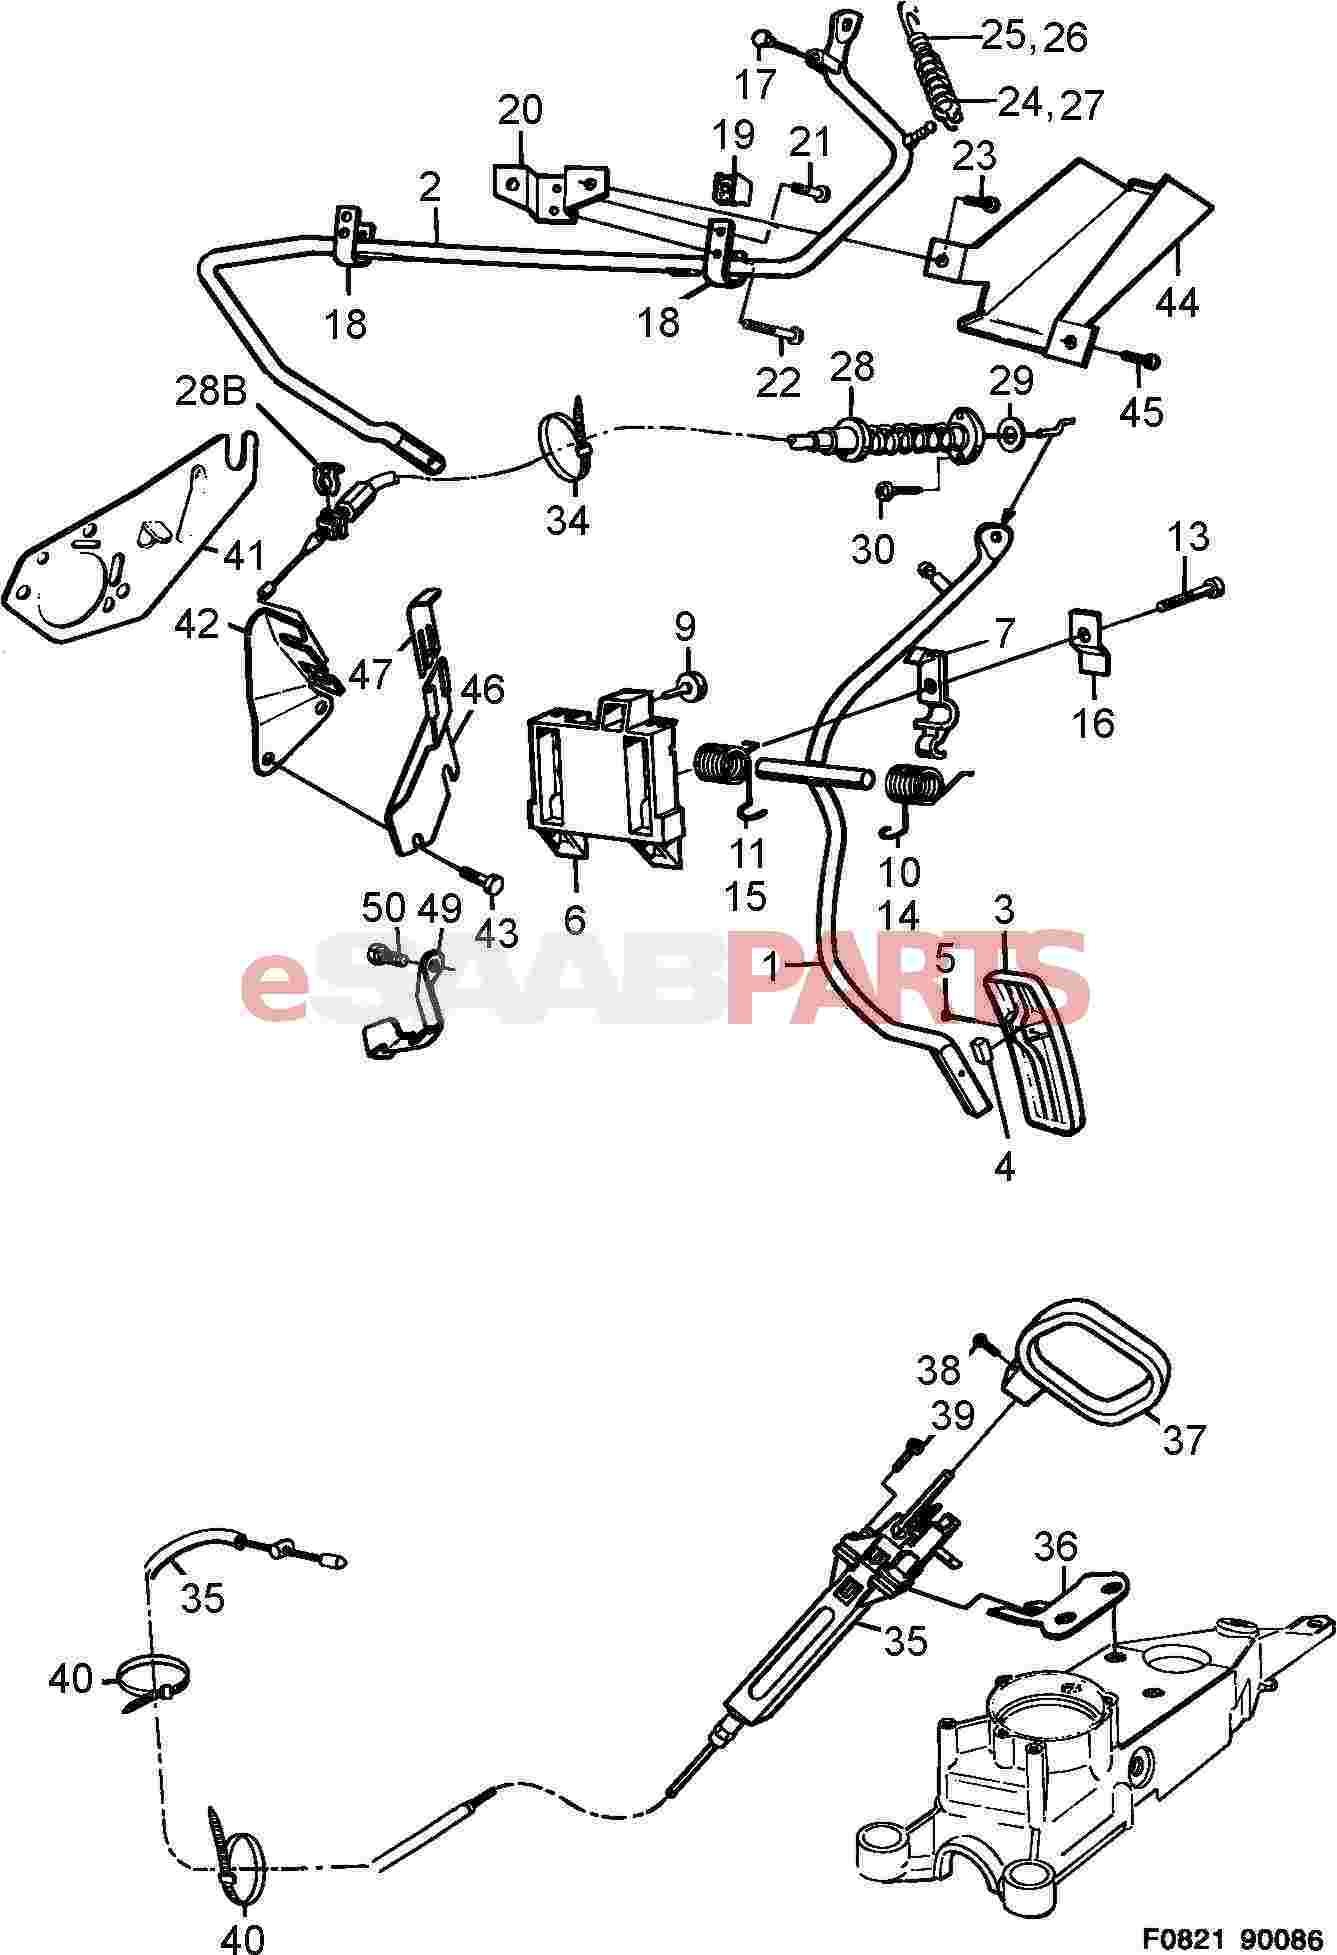 1995 saab 900 convertible hubcap | wiring diagram database saab  convertible wiring diagram on 2001 saab 1997